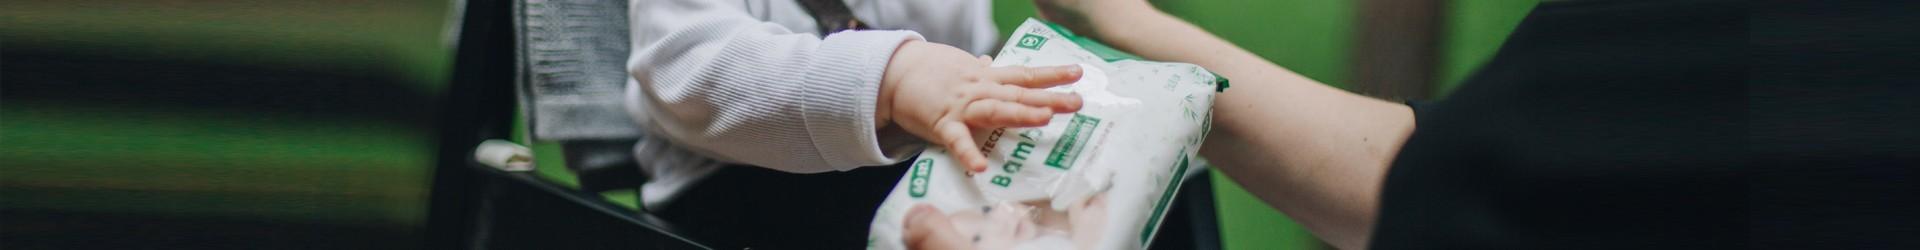 Wet wipes with bamboo fiber for children | Bambiboo.eu